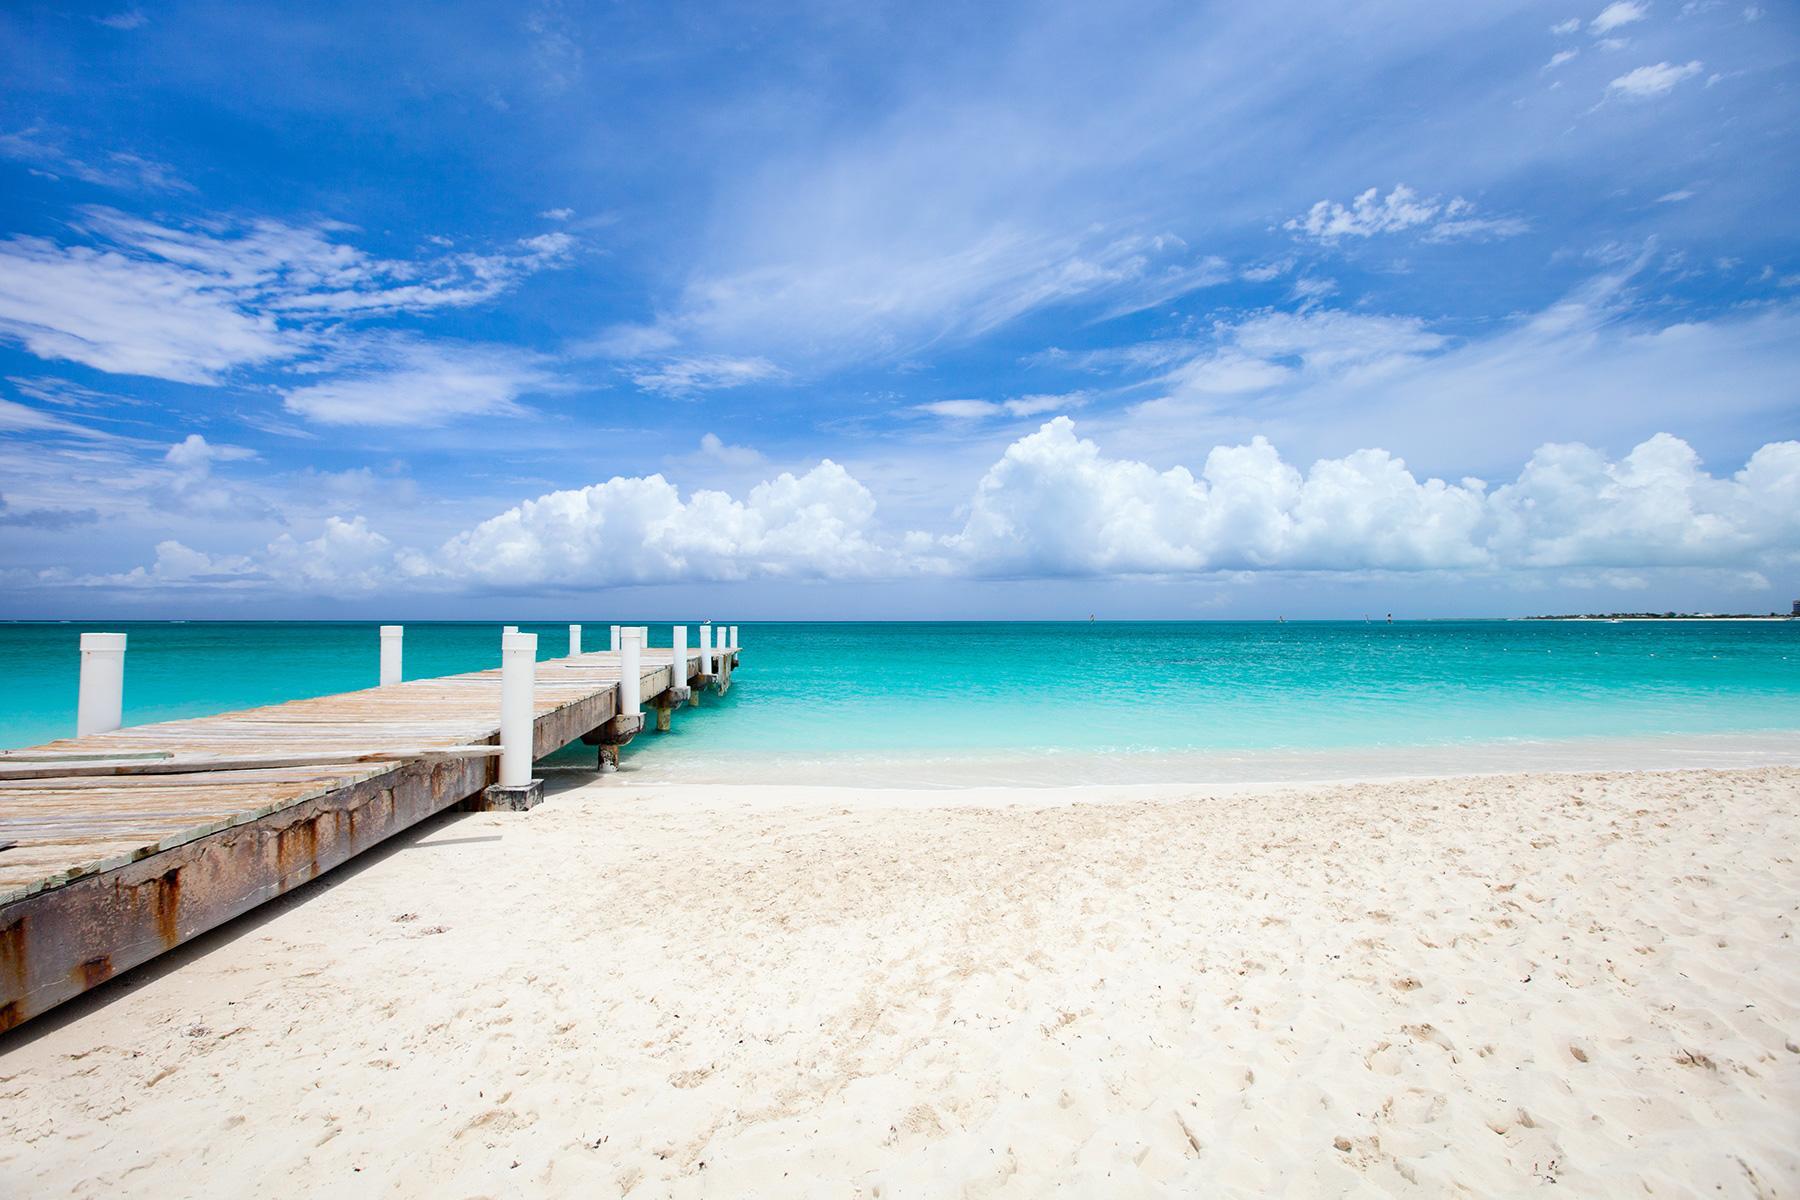 Top 15 Beach Destinations for Winter Escapes